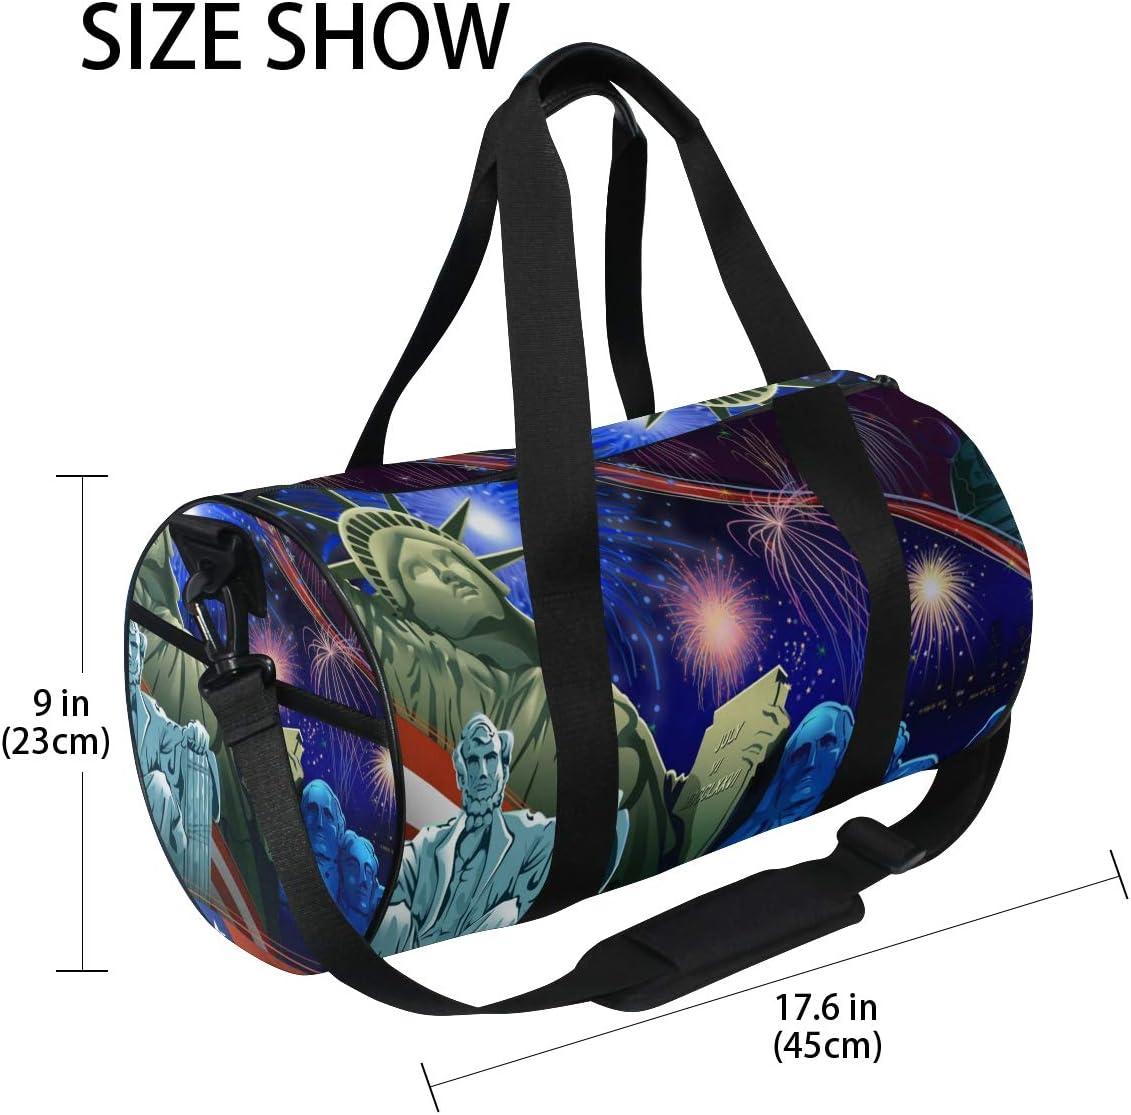 OuLian Gym Bag Live Music Women Canvas Duffel Bag Cute Sports Bag for Girls